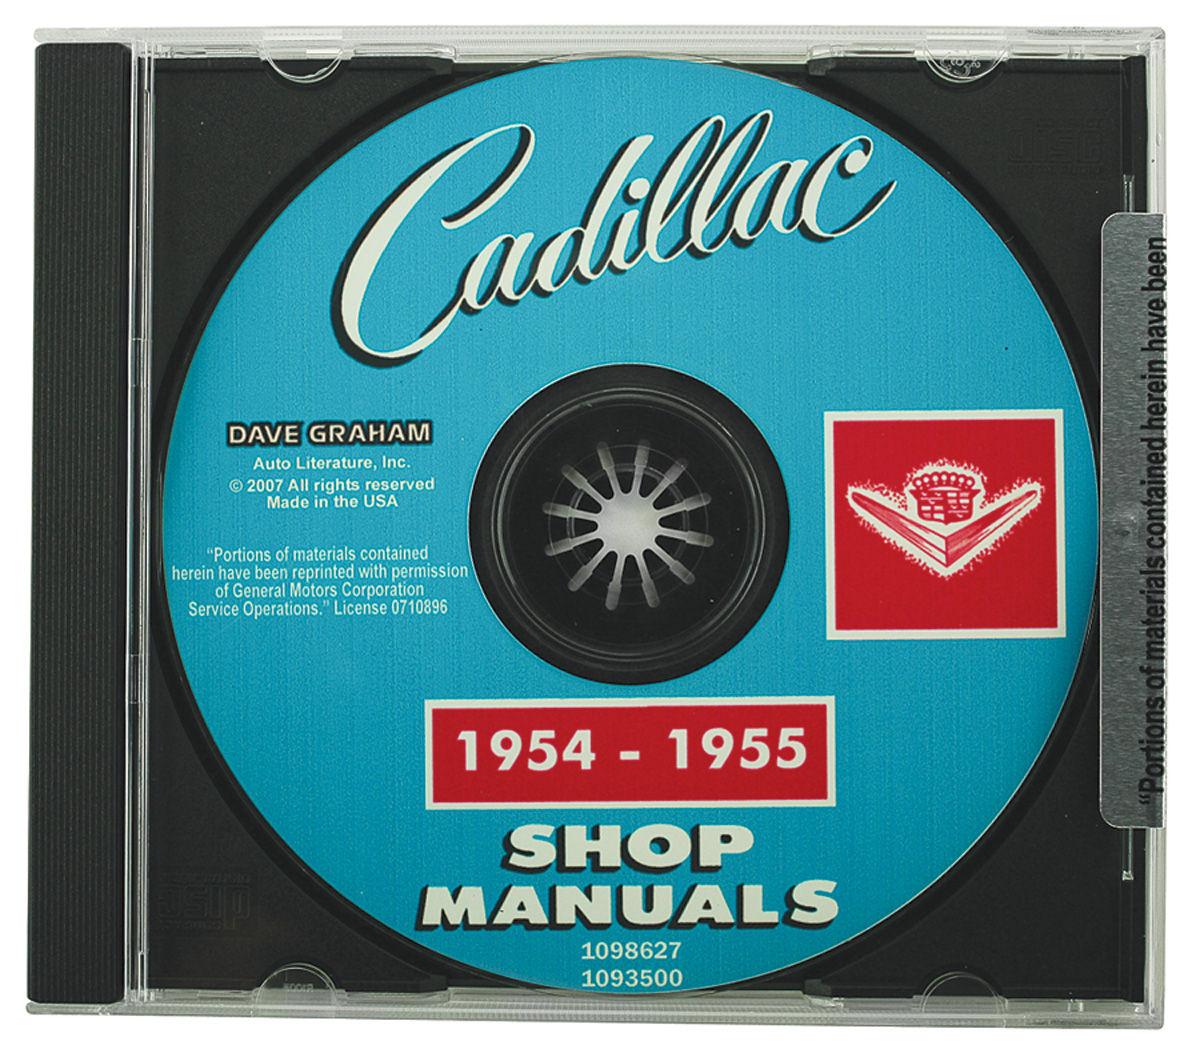 Factory Shop Manuals, CD-ROM, 1939-41 Cadillac/La Salle